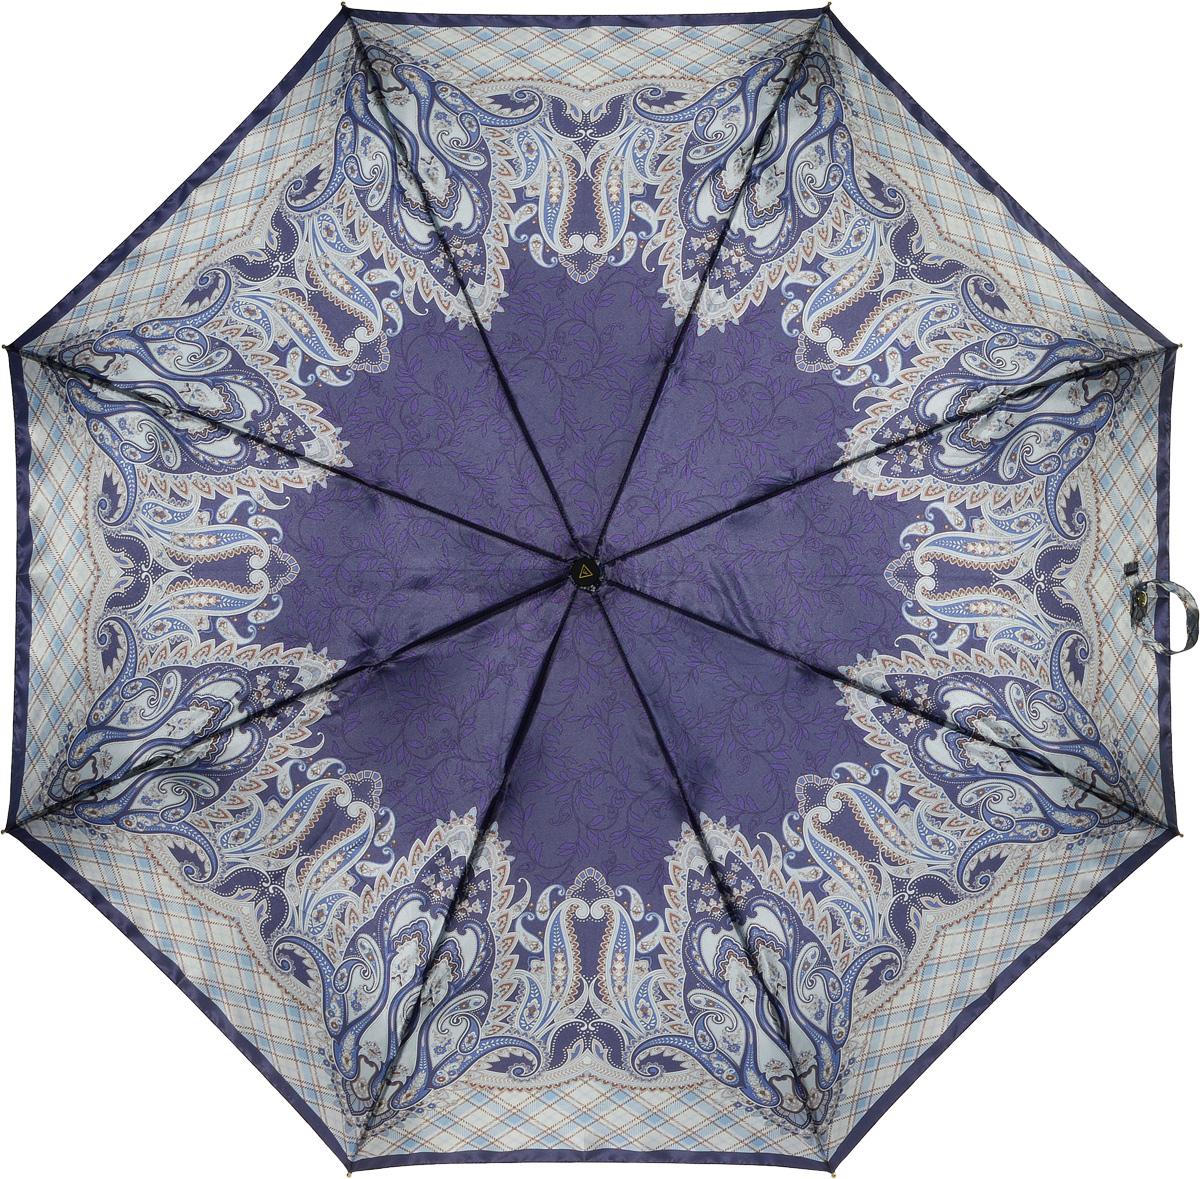 Зонт женский Fabretti, автомат, 3 сложения, цвет: мультиколор. L-16107-9L-16107-9Зонт женский Fabretti, облегченный суперавтомат, 3 сложения